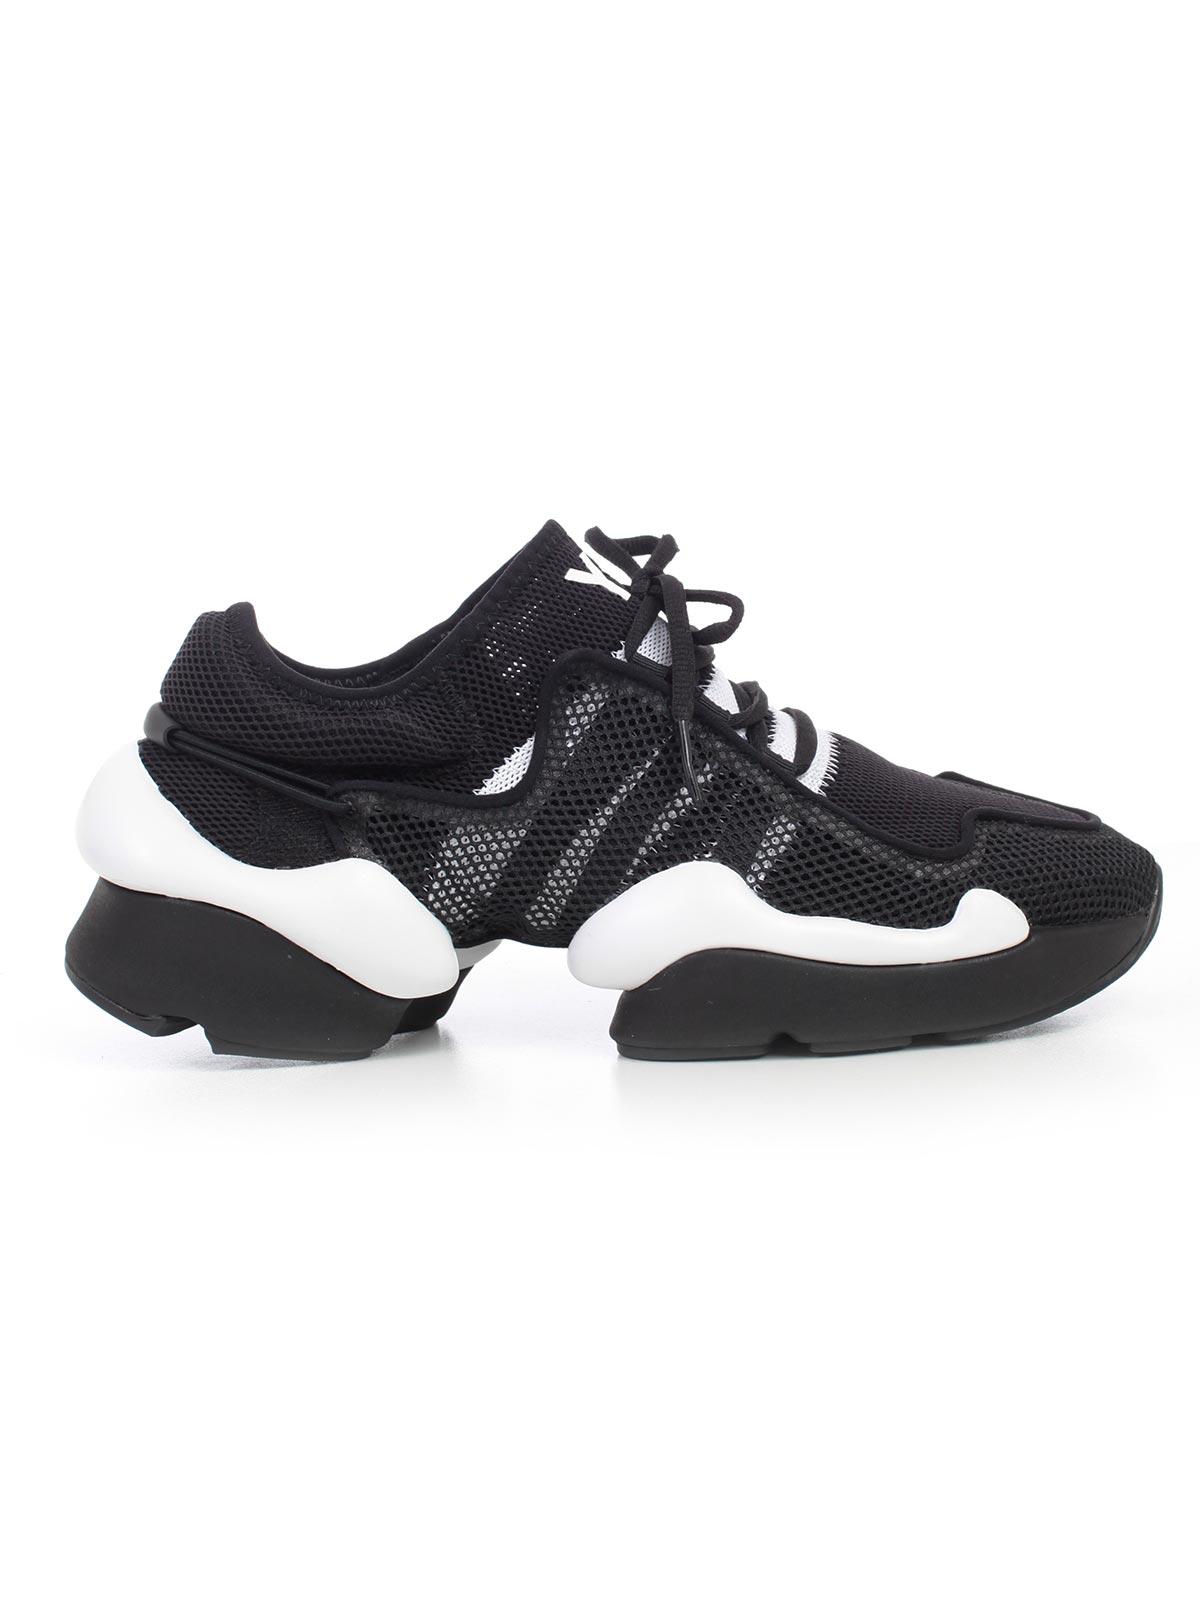 217f08f6d Y-3 Yohji Yamamoto Adidas Shoes F99797 - CORE BLACK.Bernardelli ...